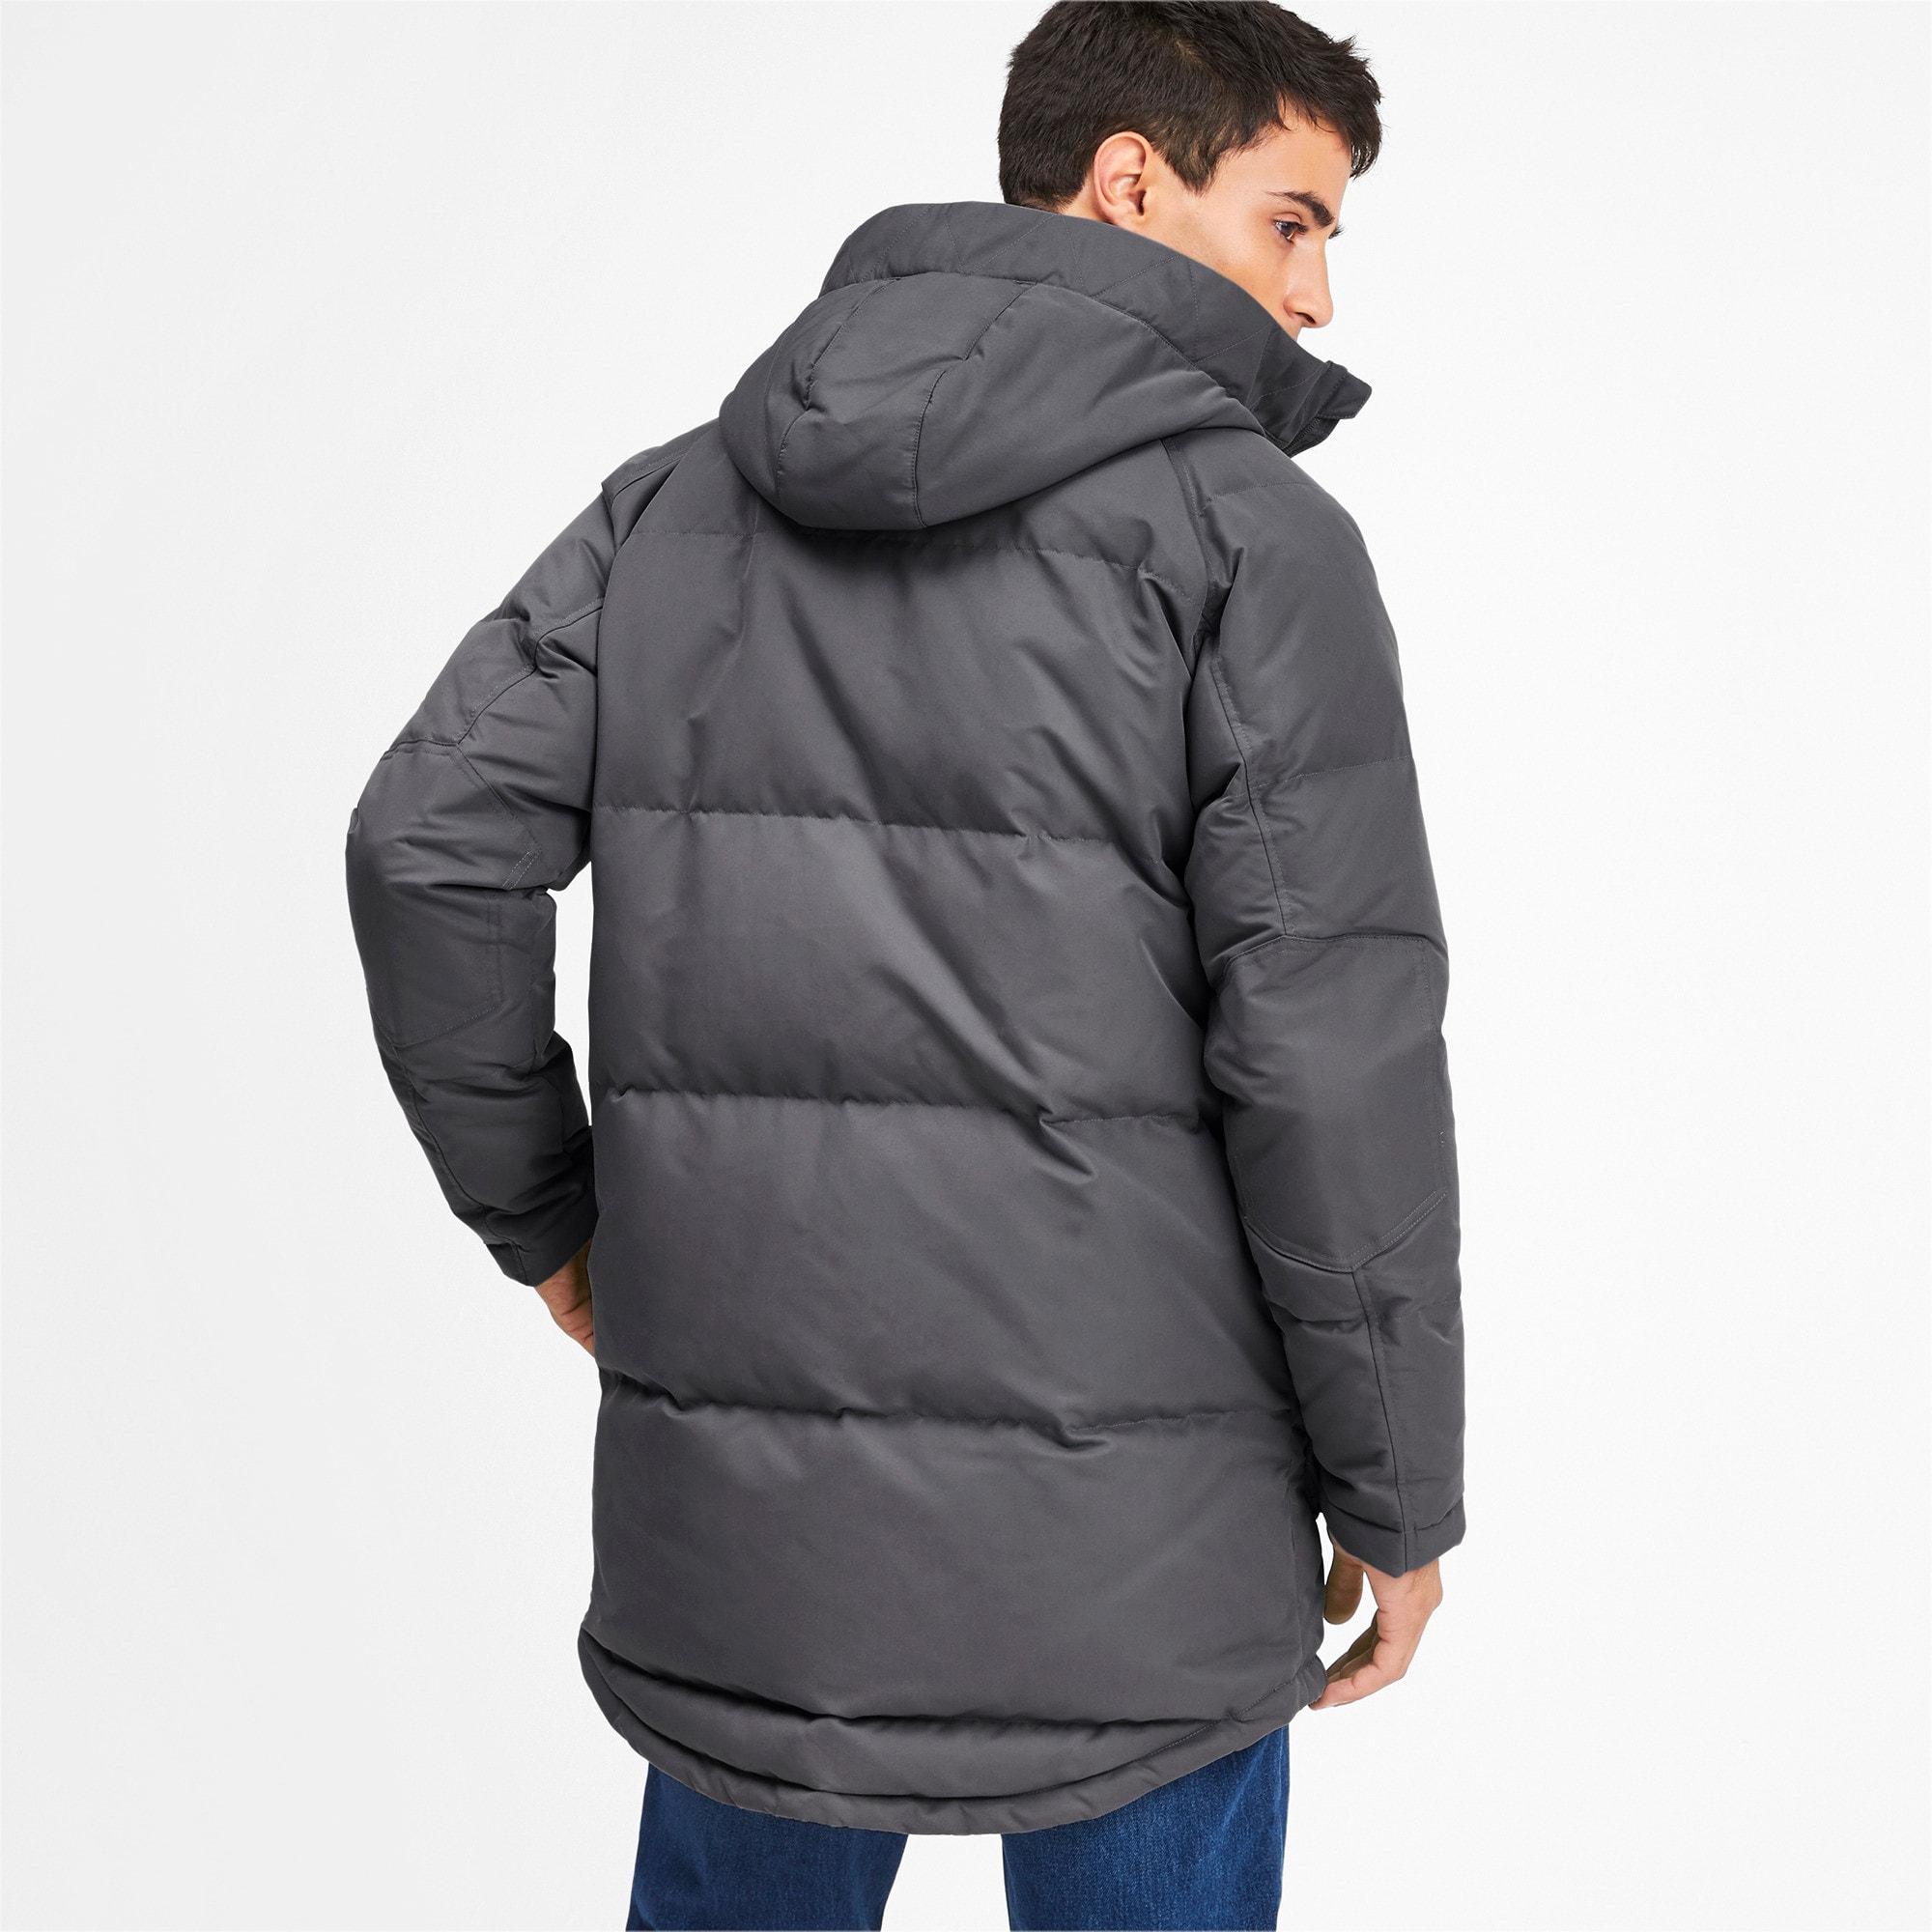 Thumbnail 2 of Oversize 500 Down Hooded Men's Jacket, CASTLEROCK, medium